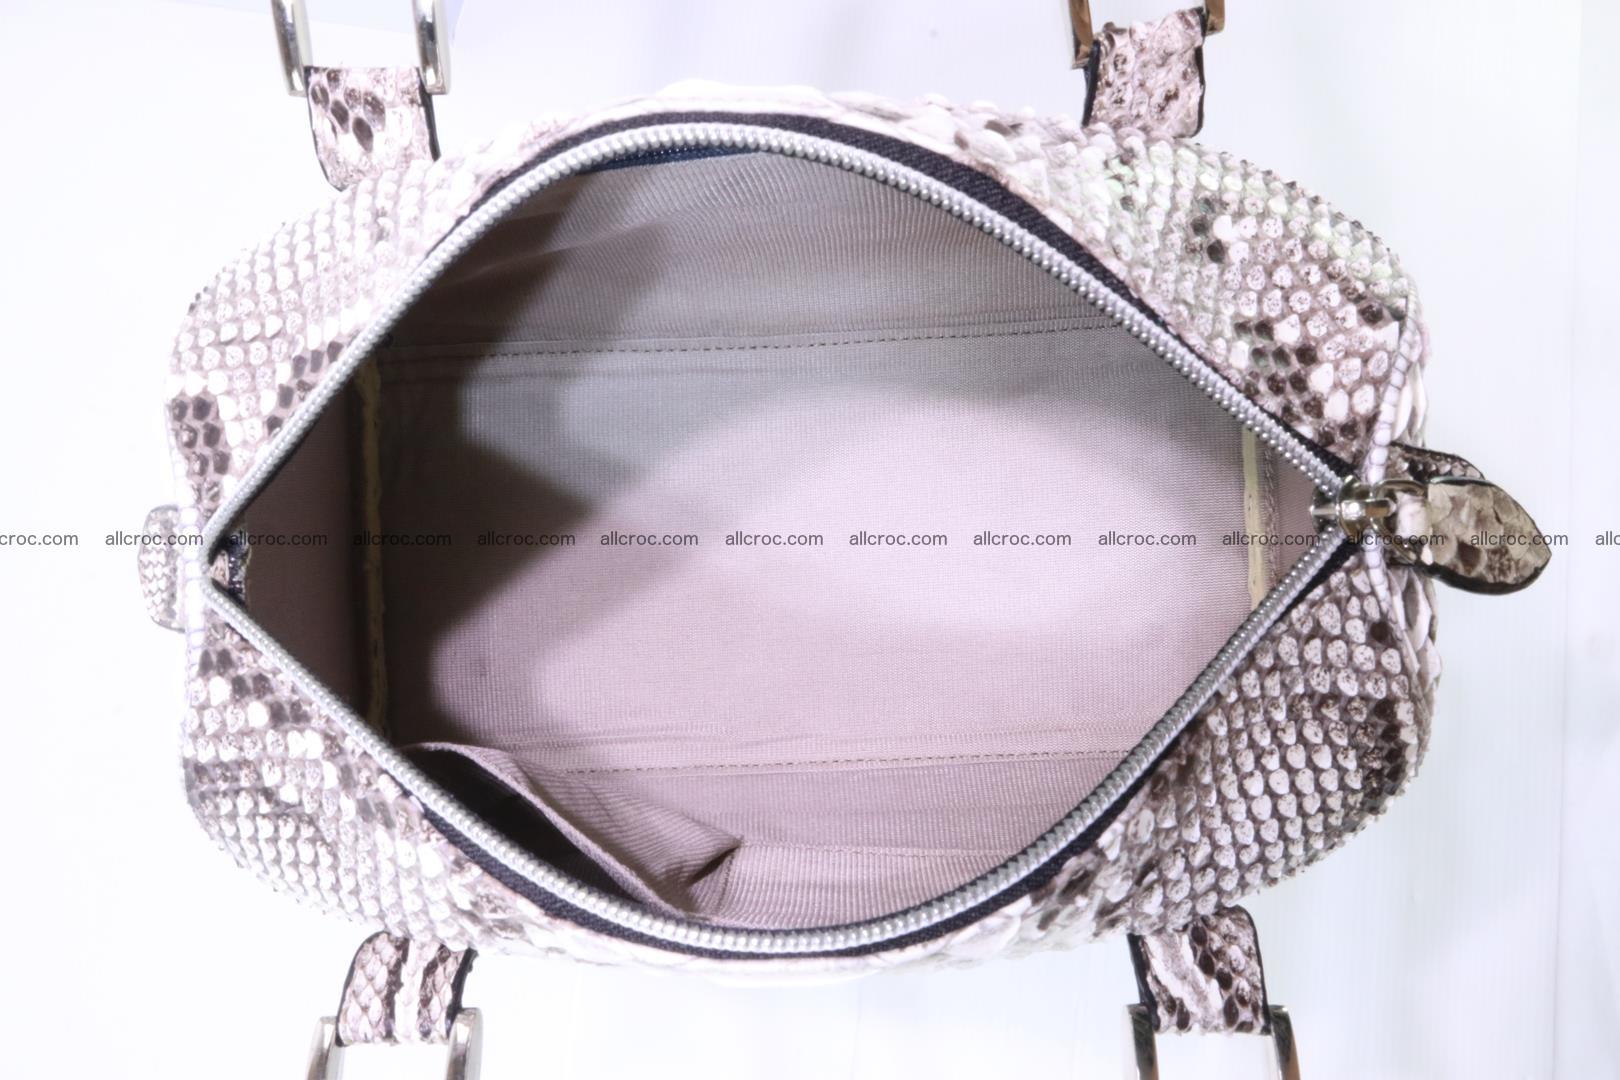 Ladies handbag, valise from genuine python skin MINI 210 Foto 11